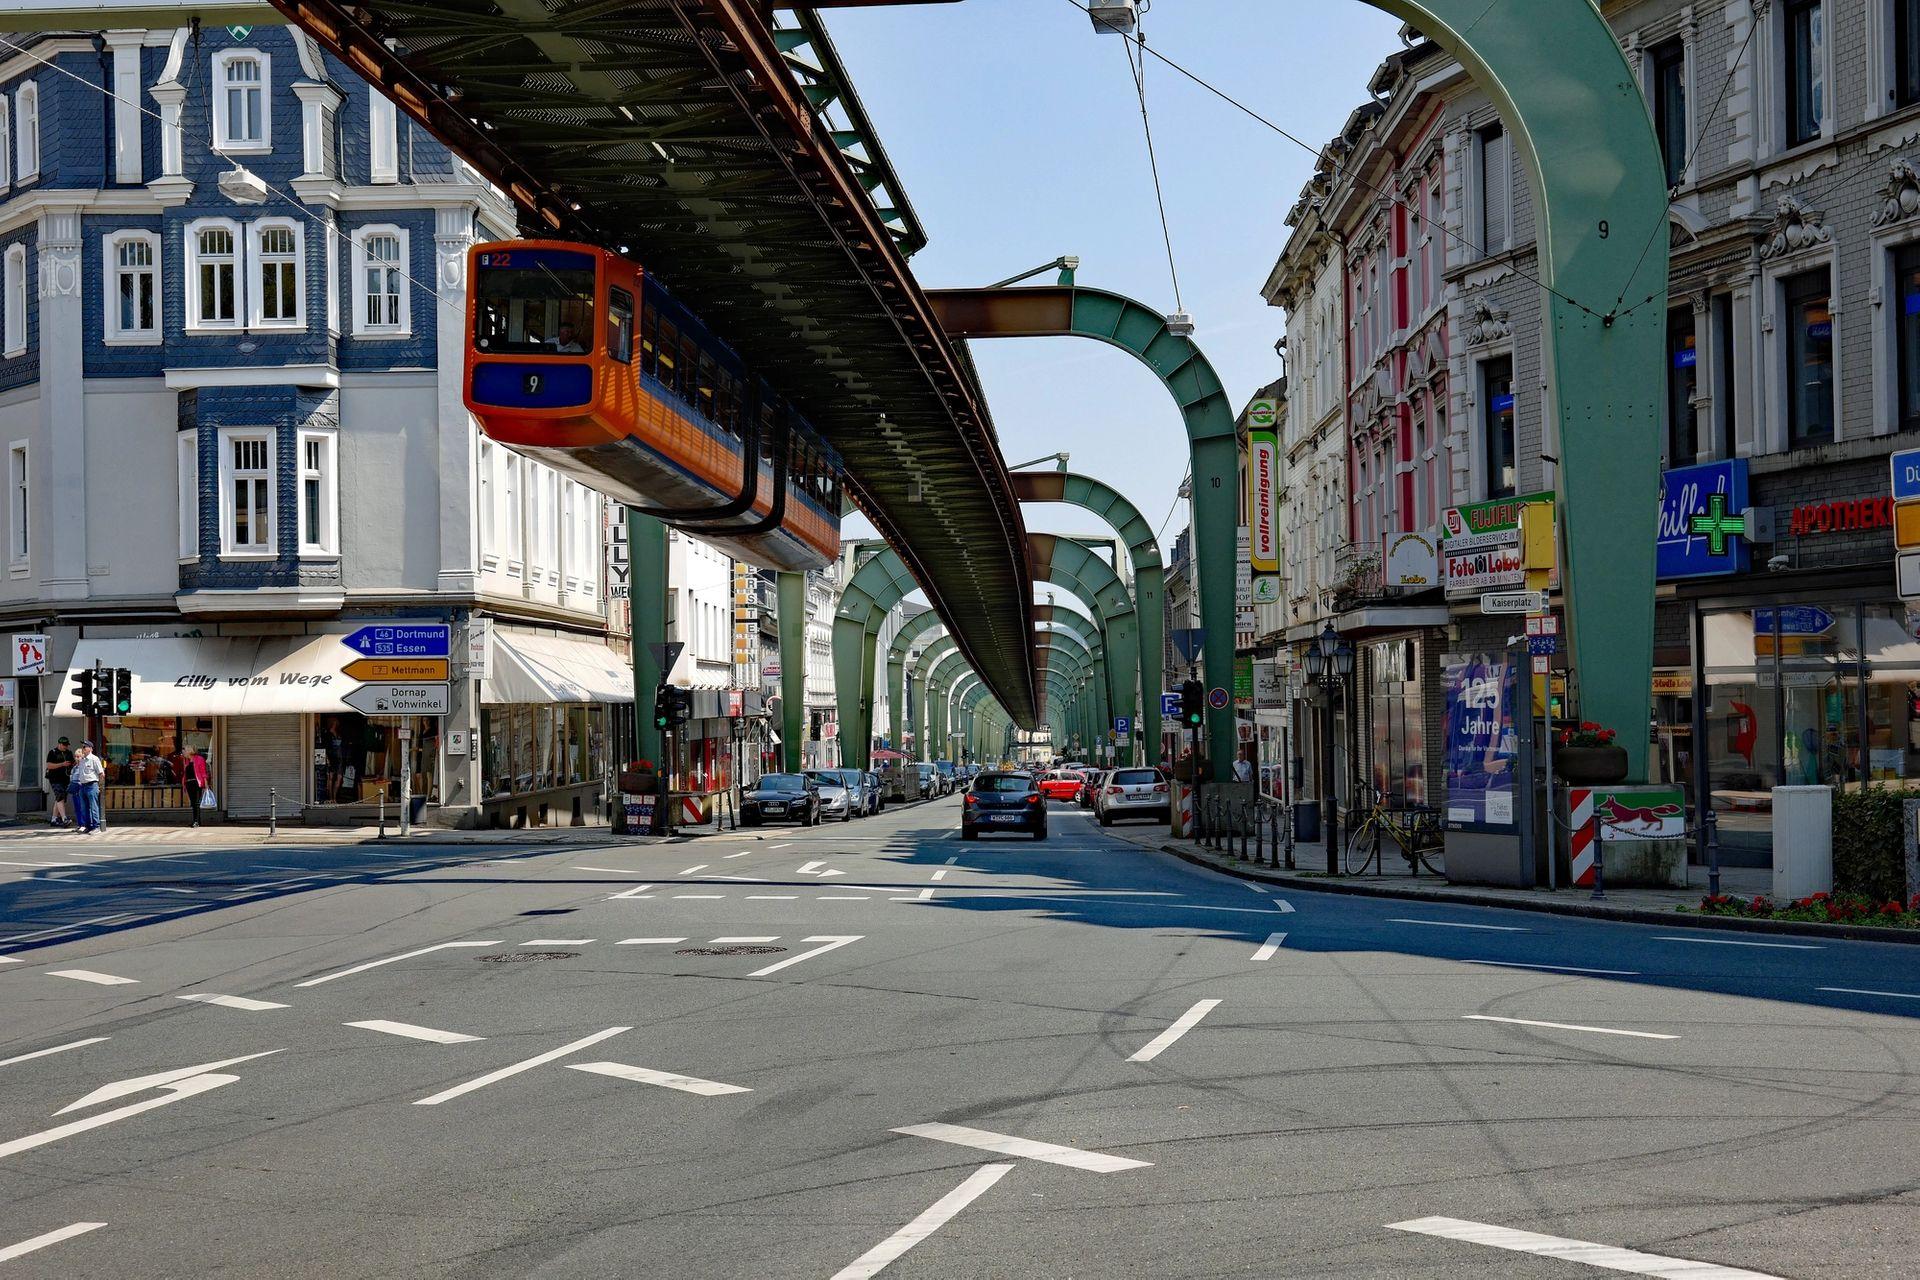 Anticimex Kammerjäger in Wuppertal